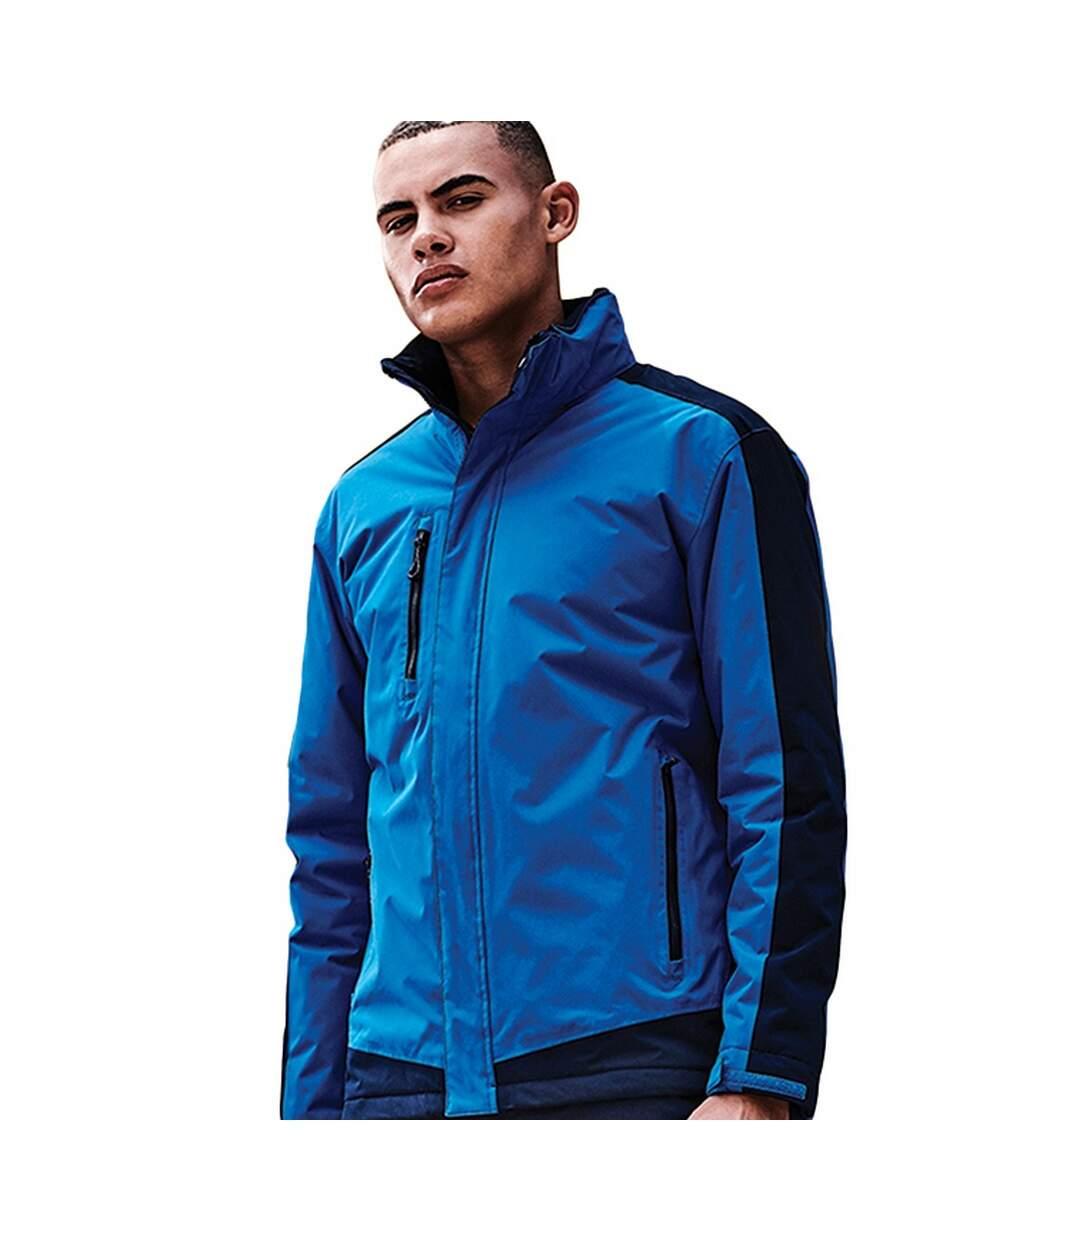 Regatta - Manteau thermique CONTRAST - Homme (Bleu marine / bleu roi) - UTRW6354